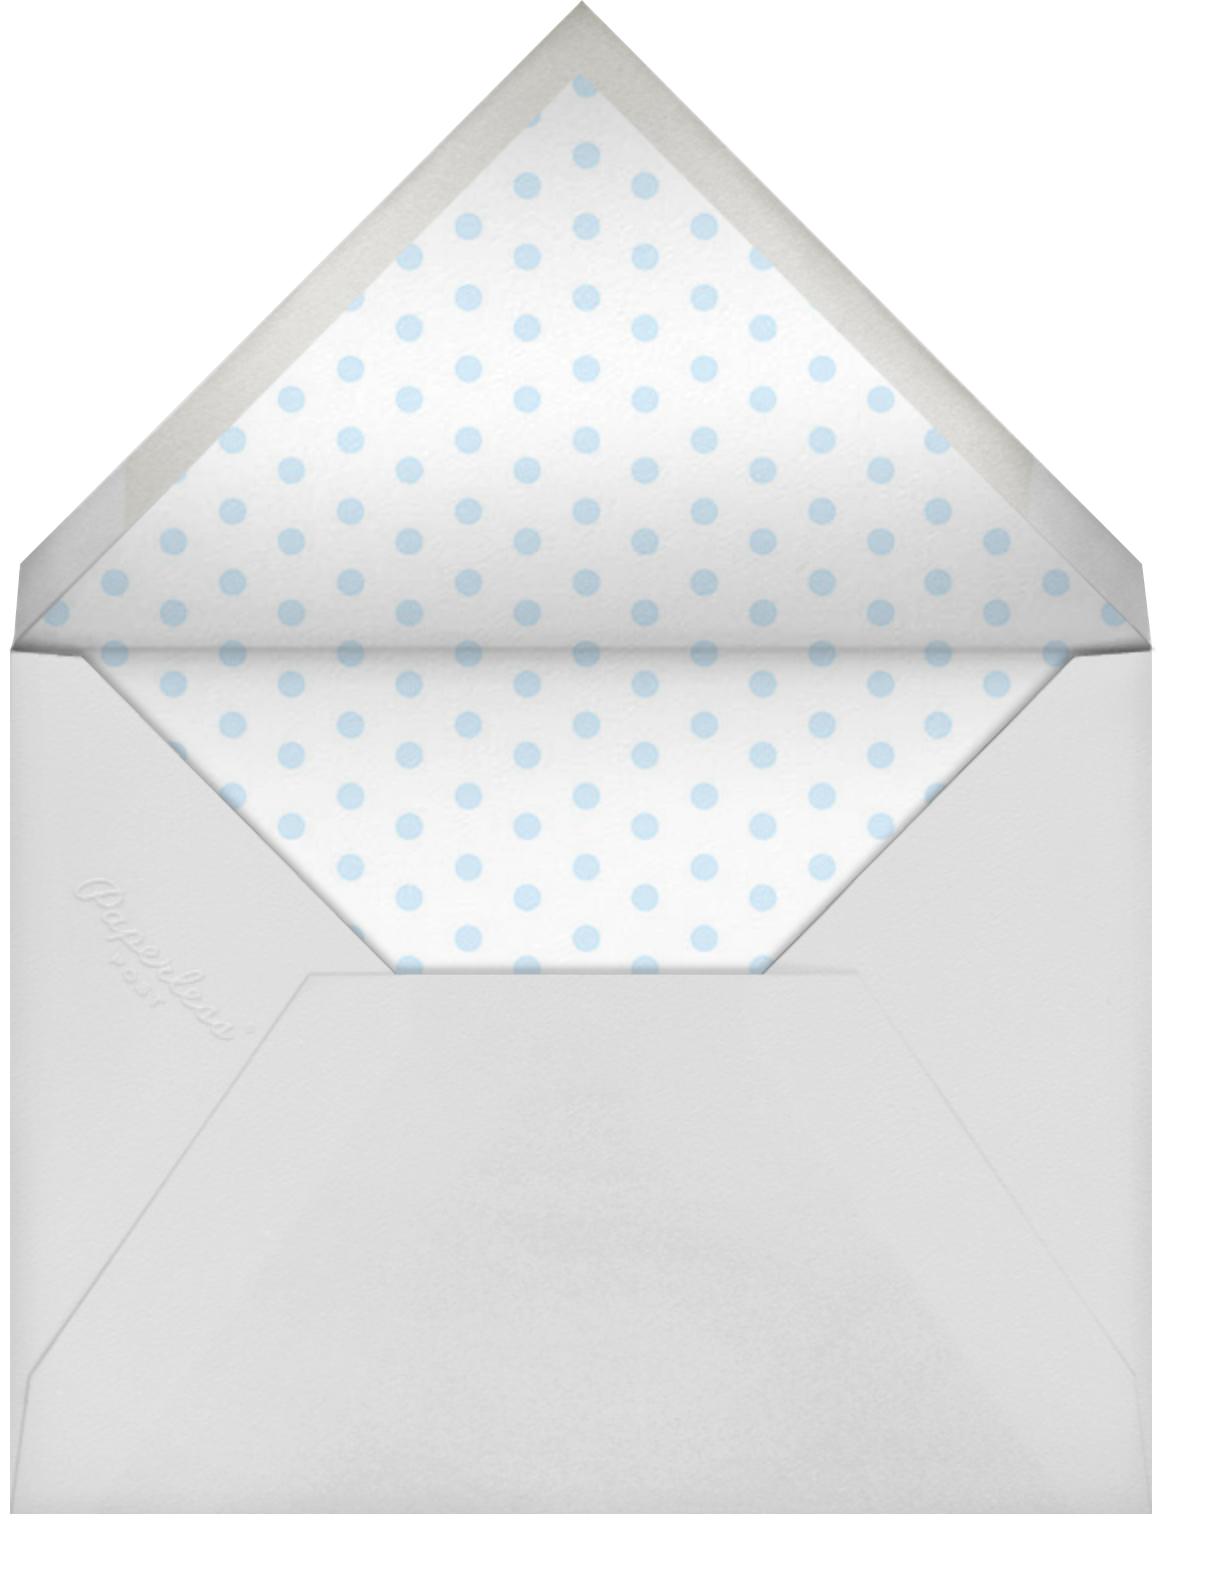 Carnaby (Tall) - Light Blue - Paperless Post - Envelope